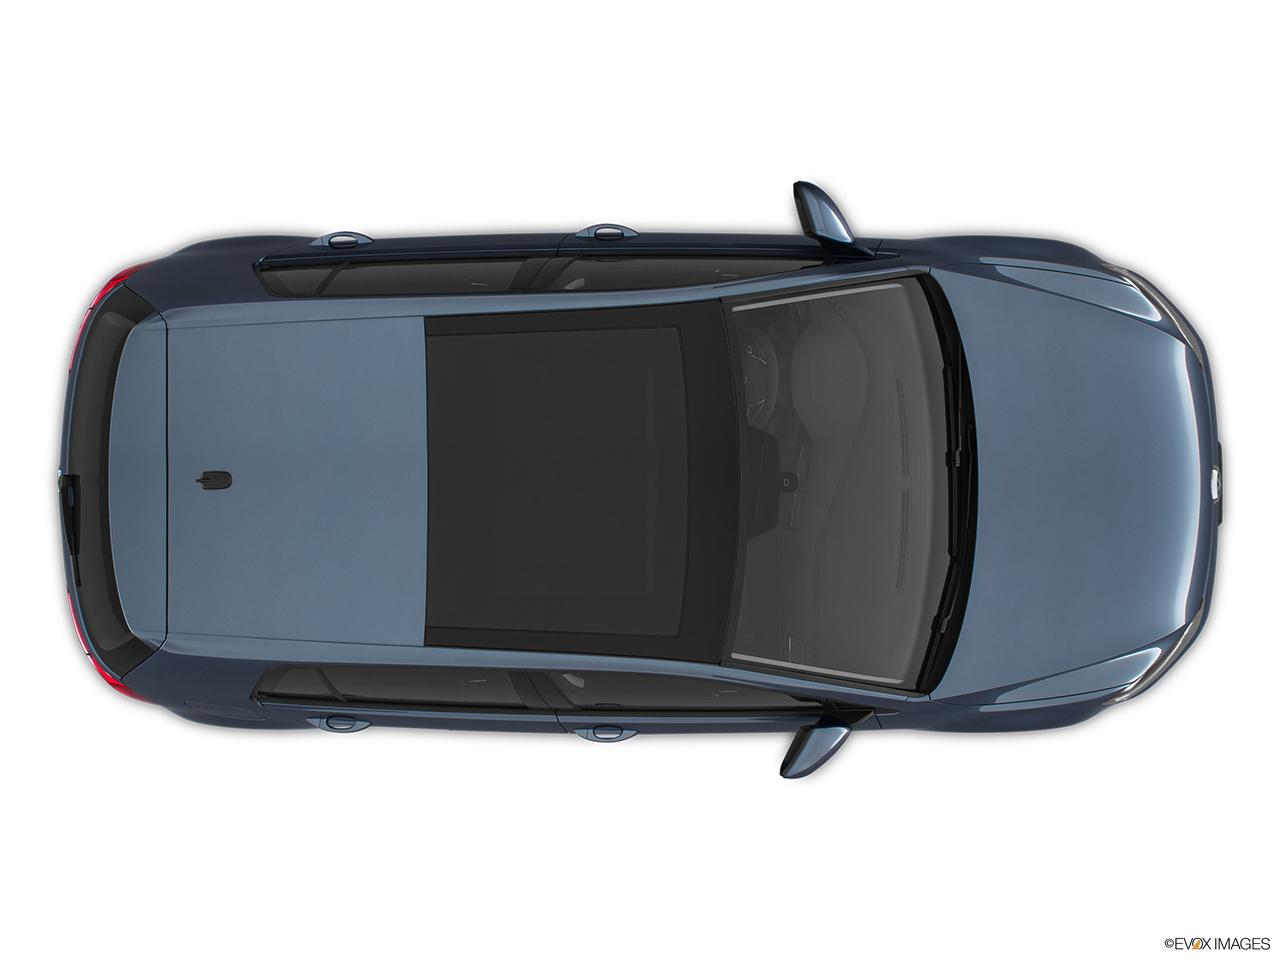 2015 Volkswagen Golf Manual TDI SEL Hatchback - Overhead